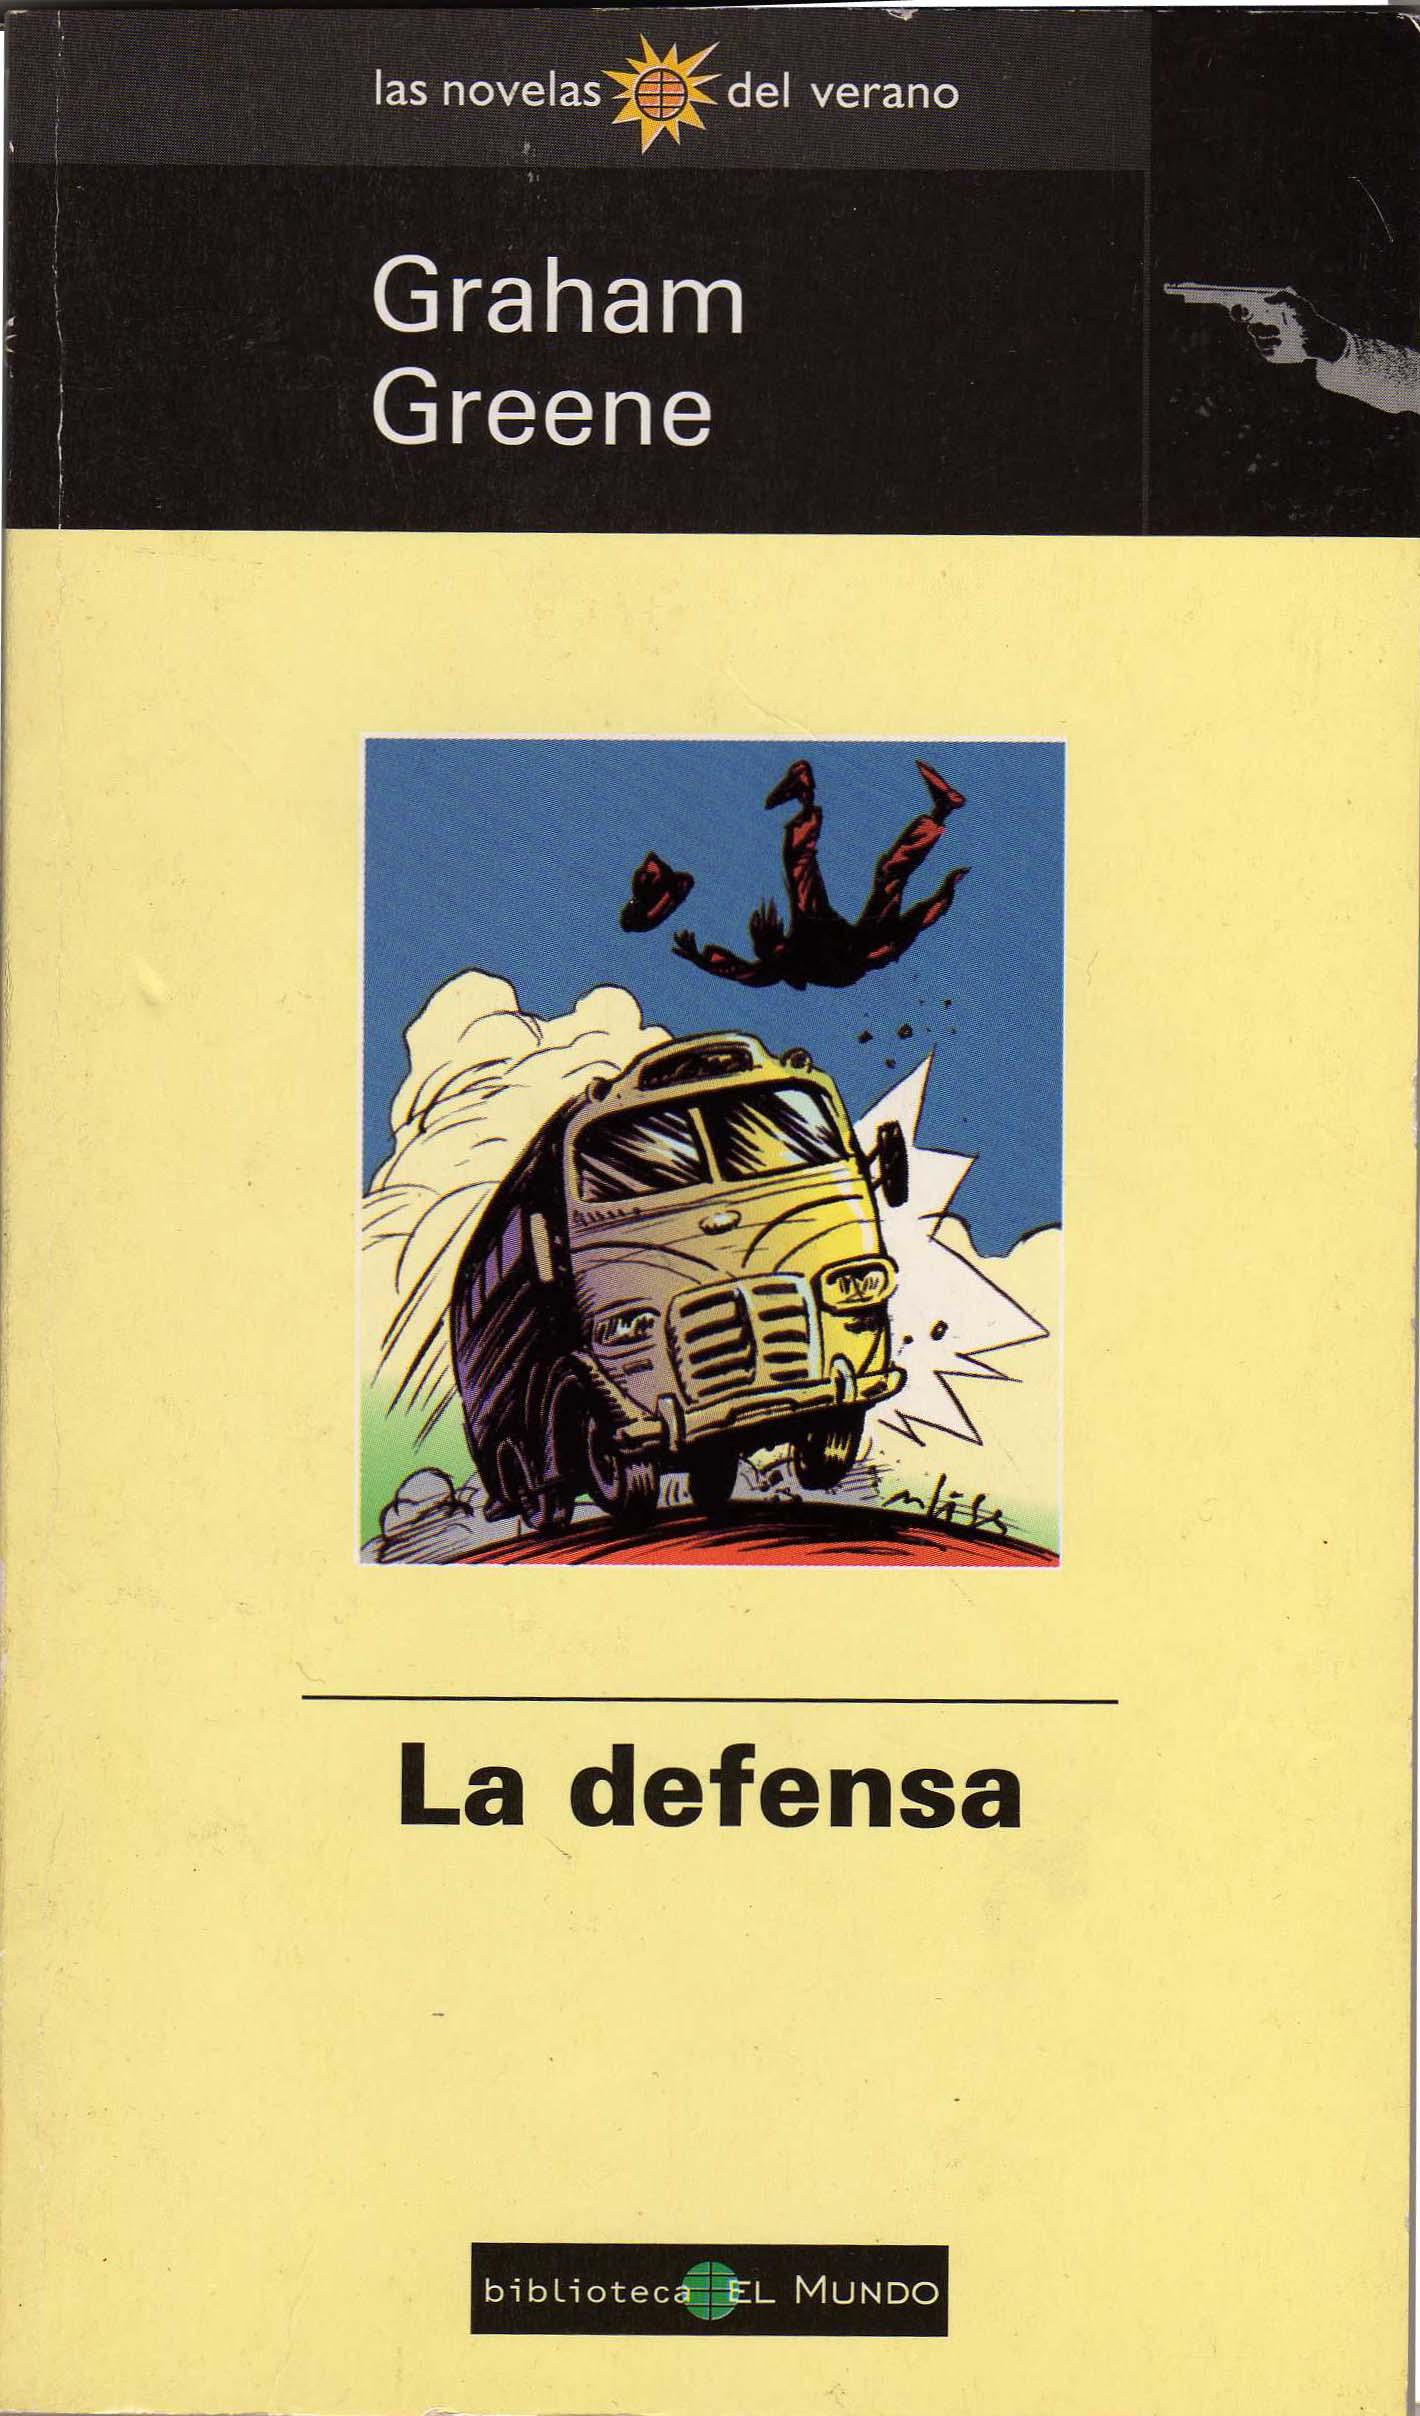 Defensa, La